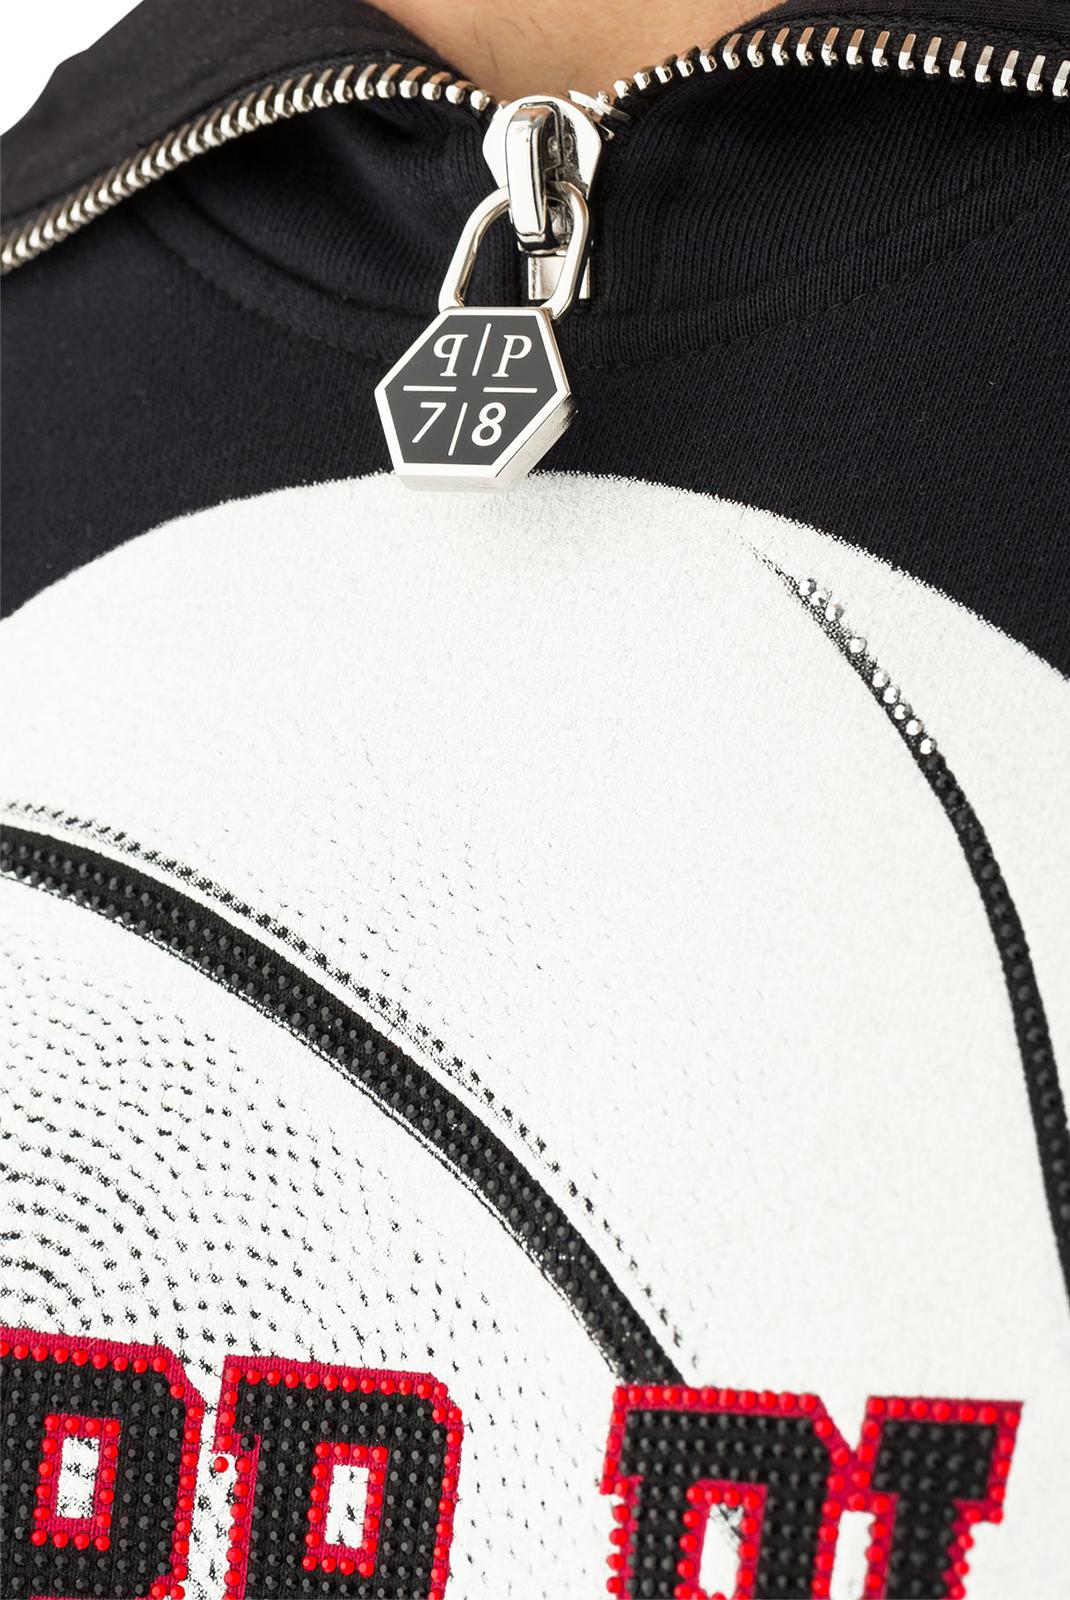 Sweatshirts  Philipp plein MJO0041 BELL 02 BLACK